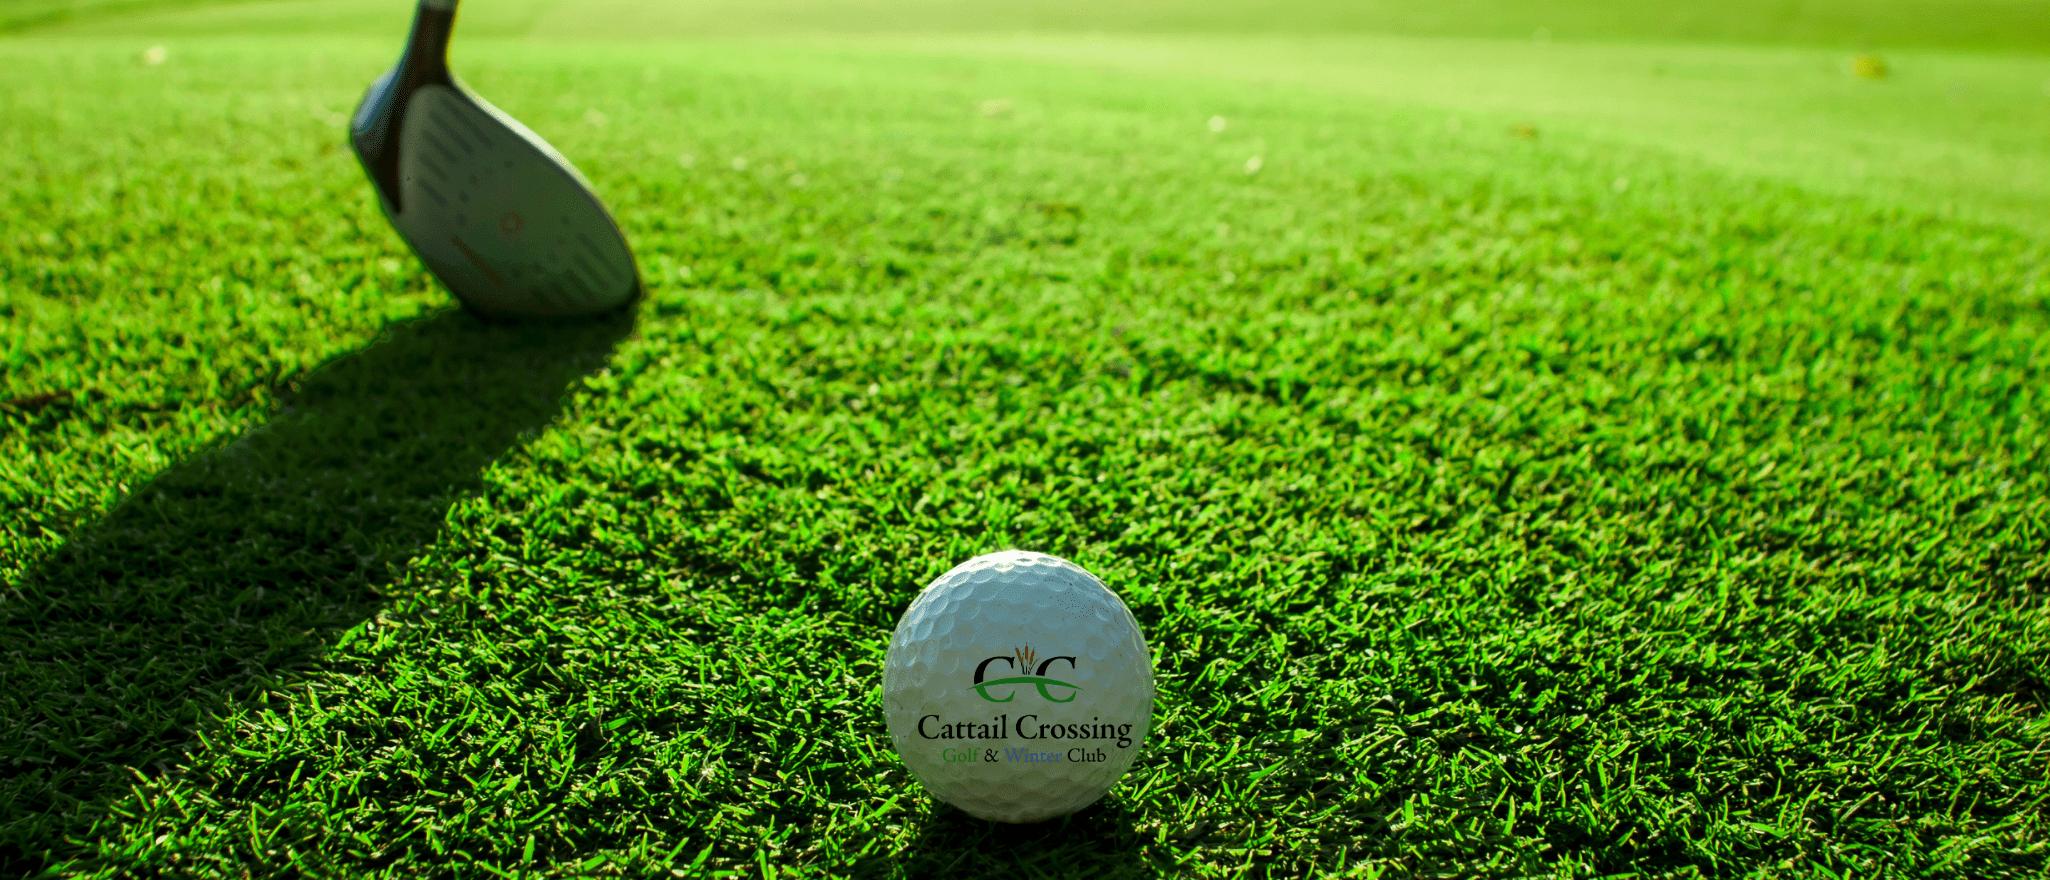 cattail crossing golf